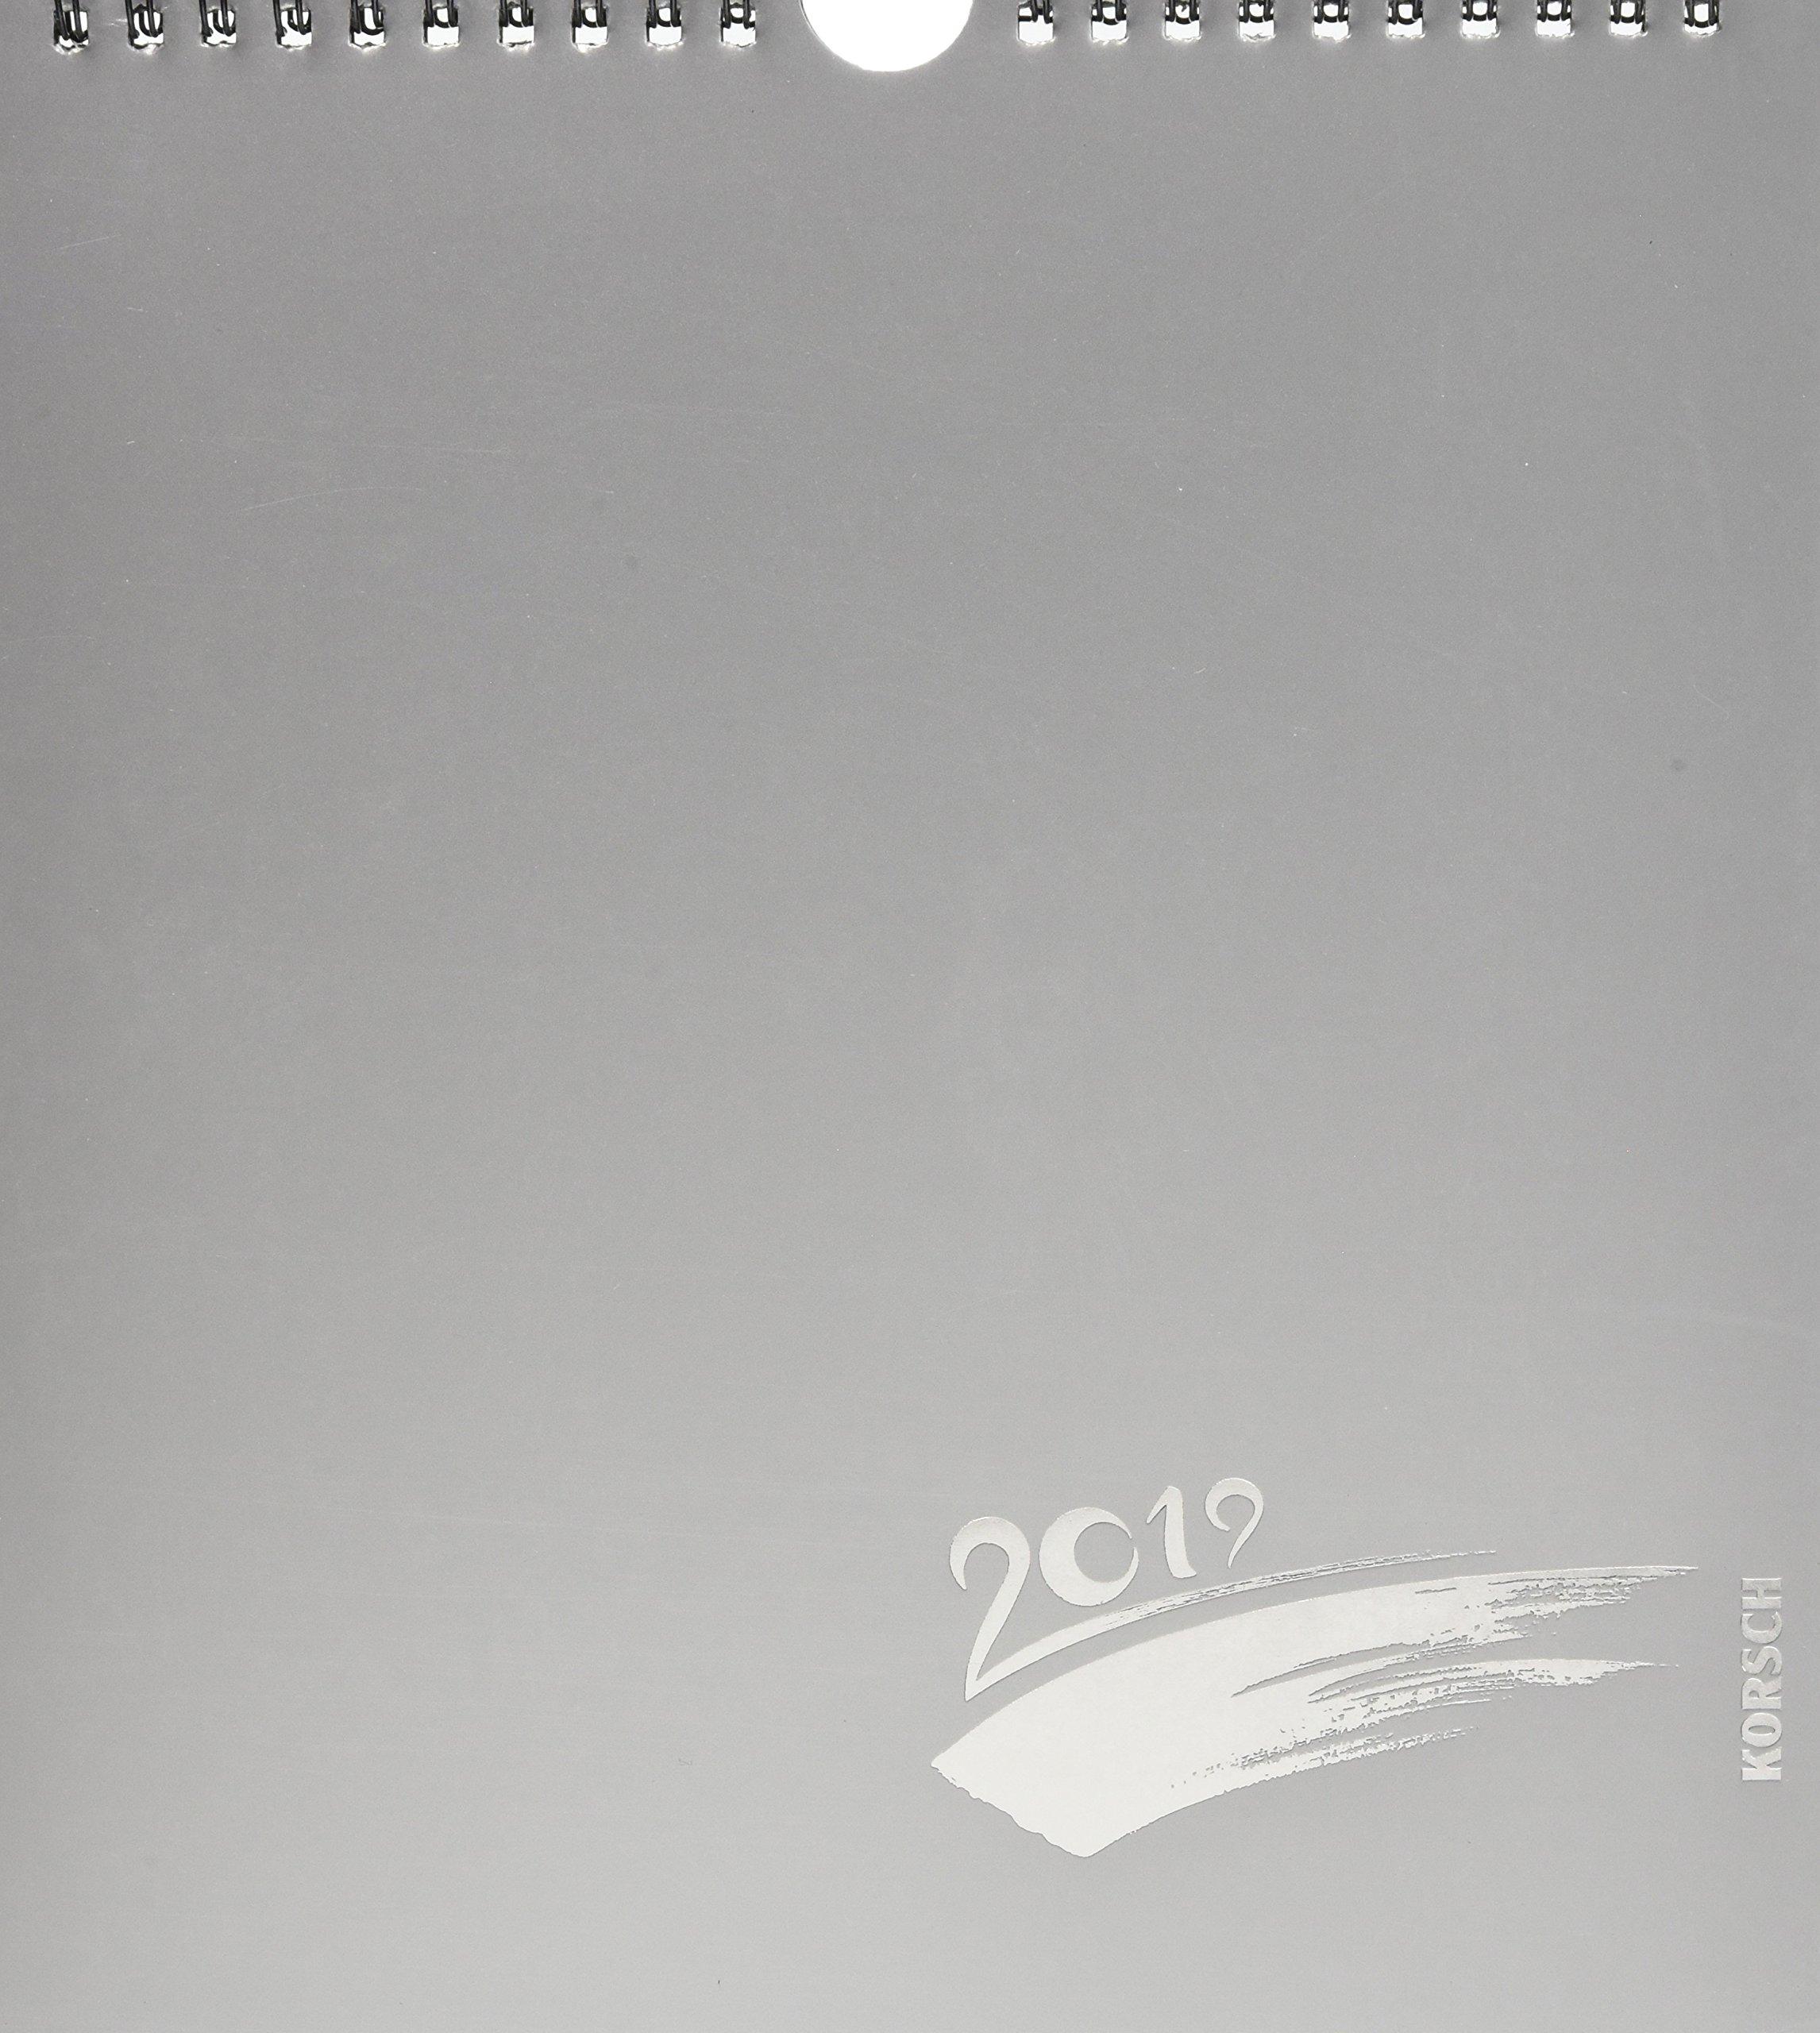 Foto-Malen-Basteln Bastelkalender silber 2019: Fotokalender zum Selbstgestalten. Do-it-yourself Kalender mit festem Fotokarton. Edle Folienprägung. Format: 21,5 x 24 cm Kalender – Wandkalender, 1. April 2018 Korsch Verlag 3731833557 Basteln / Handarbeiten